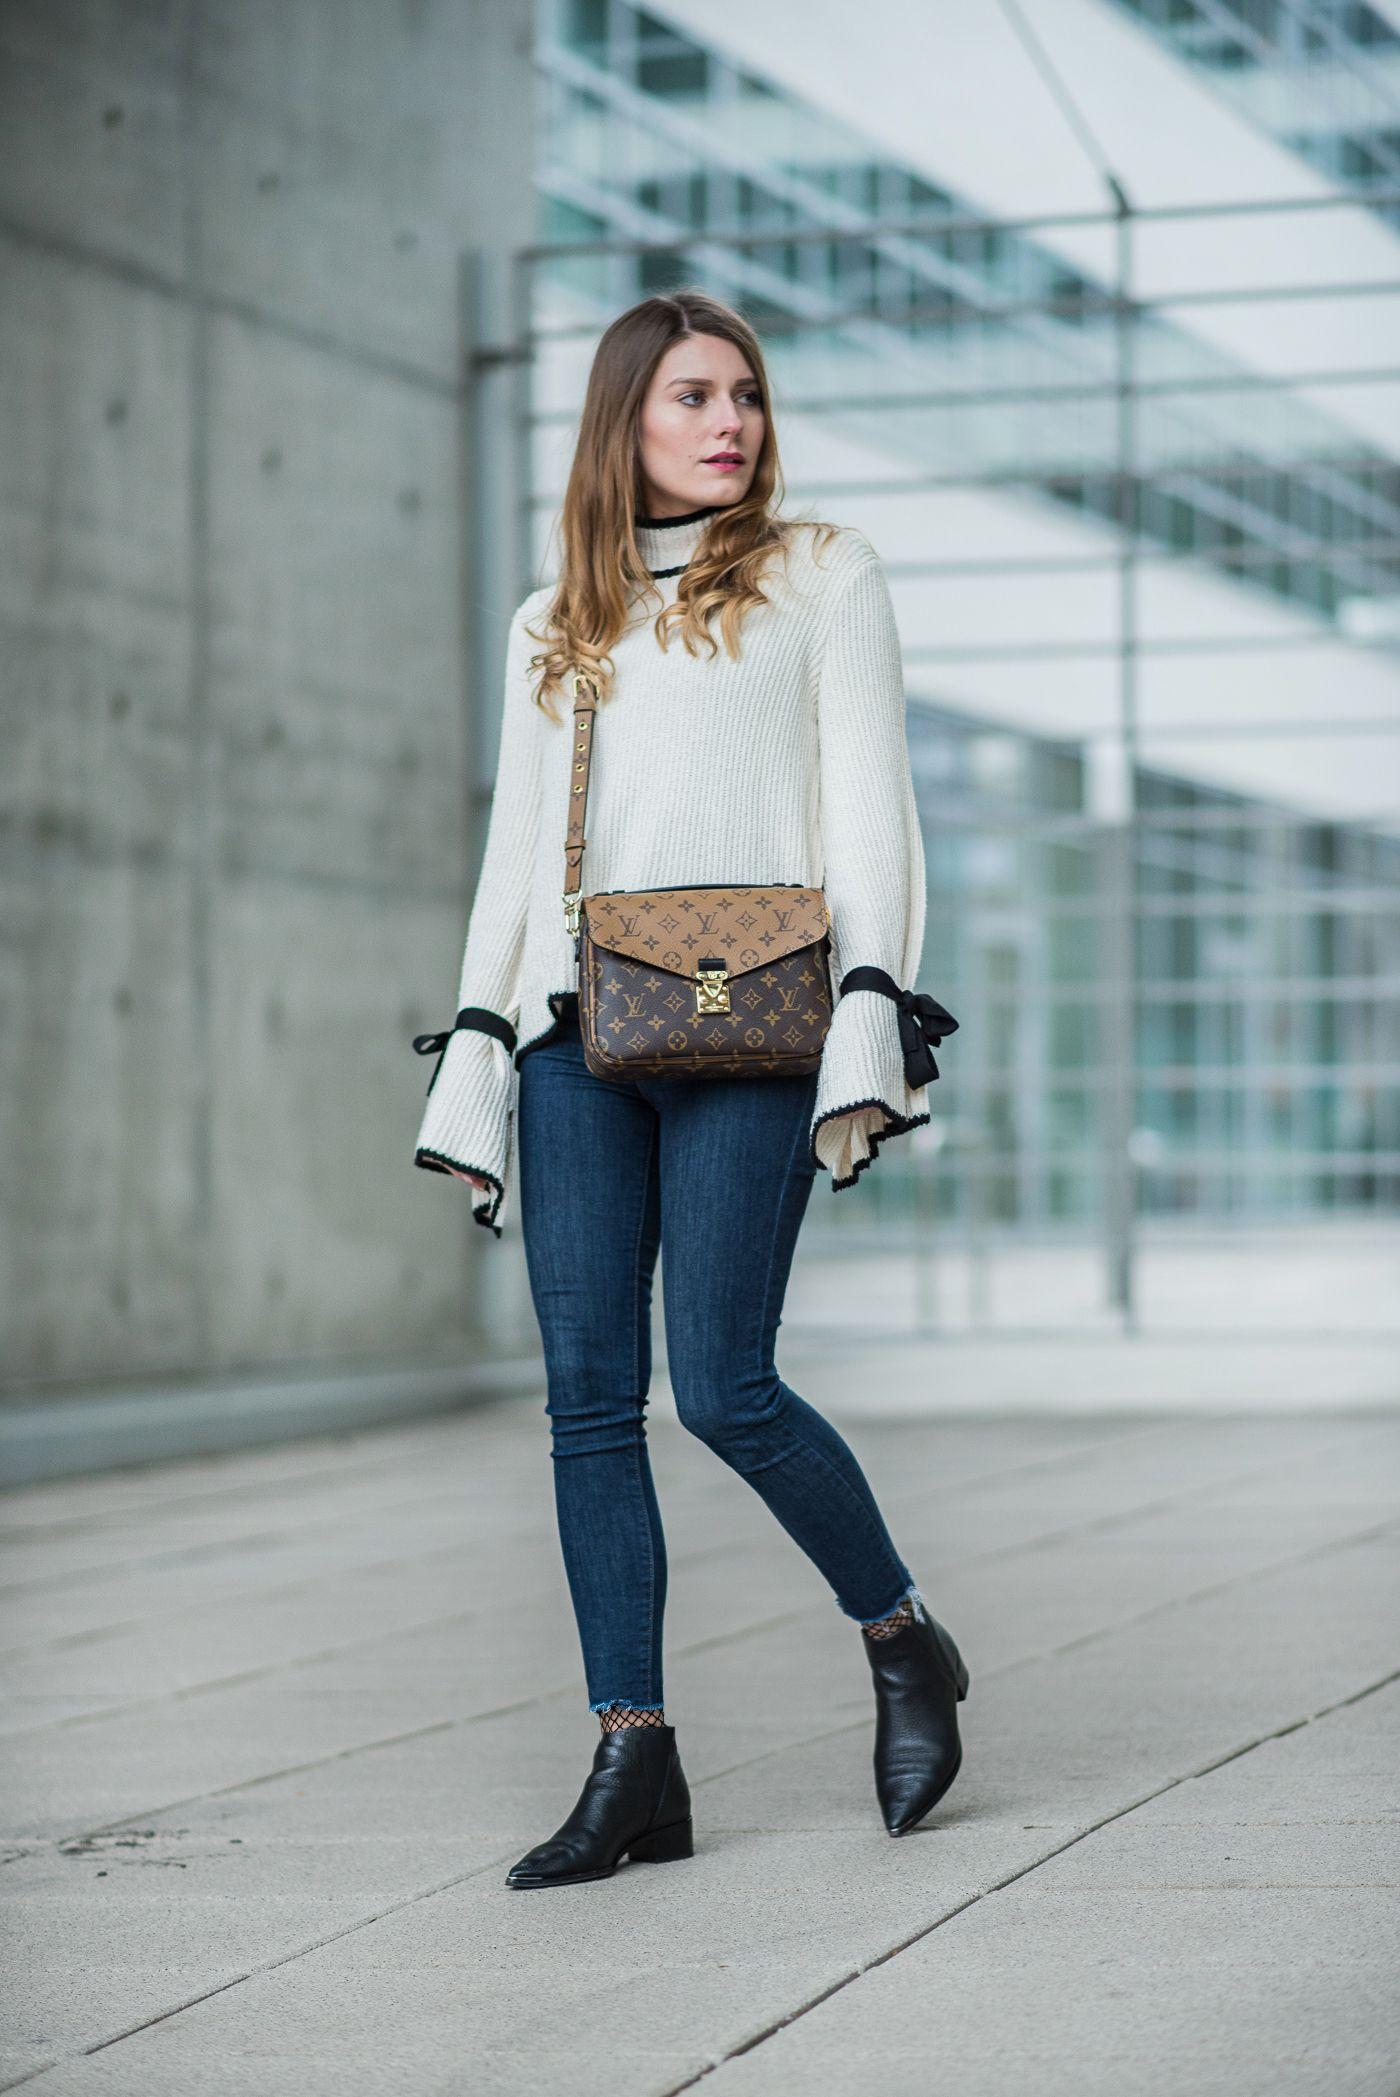 Louis Vuitton Pochette Metis Bag Fashion Louis Vuitton